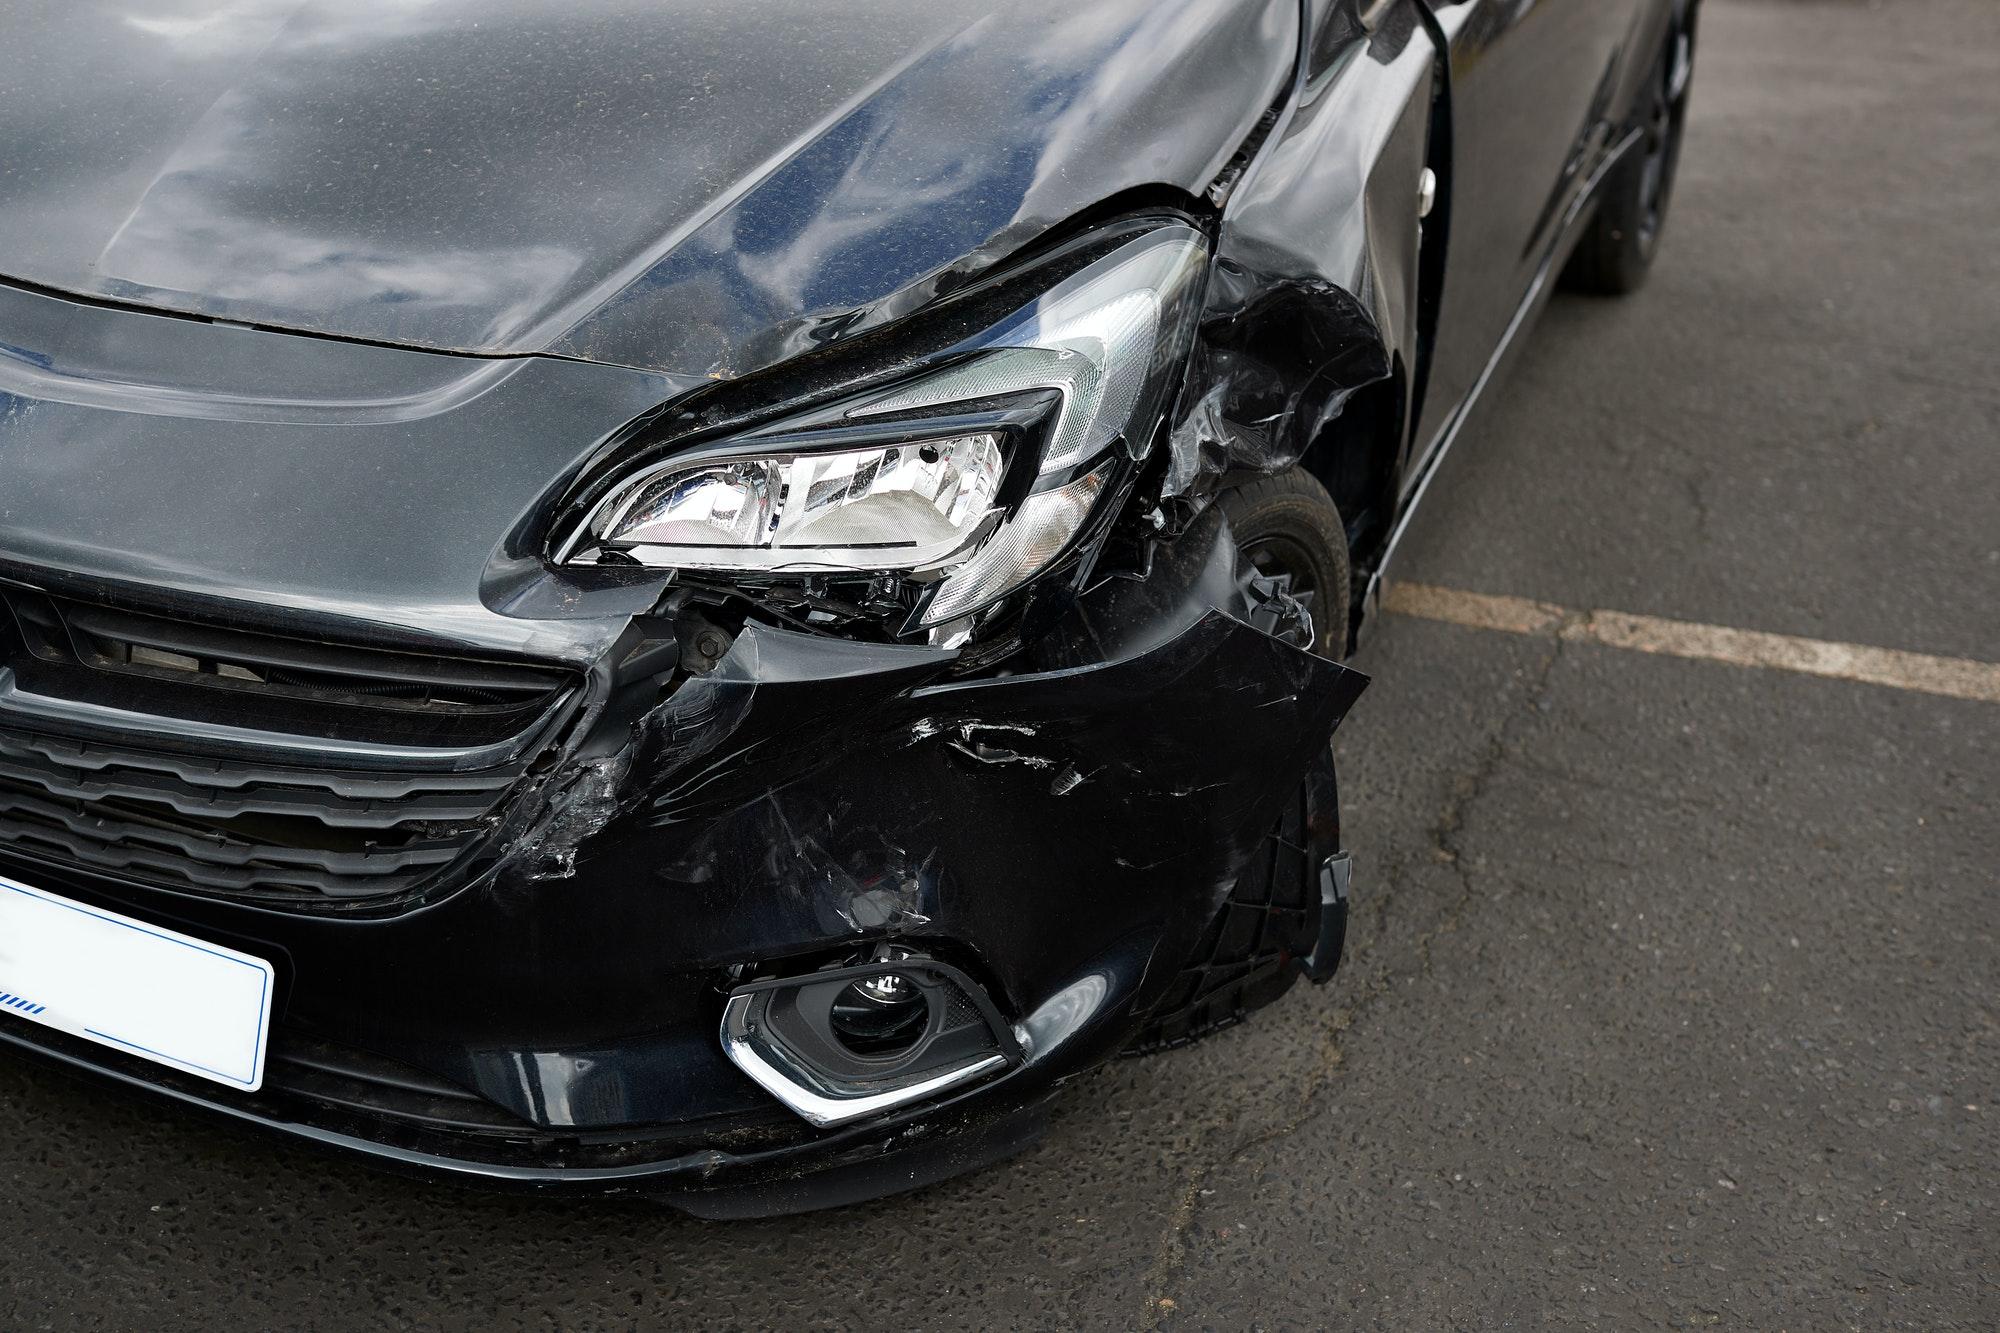 remibakker.de - Autoschaden